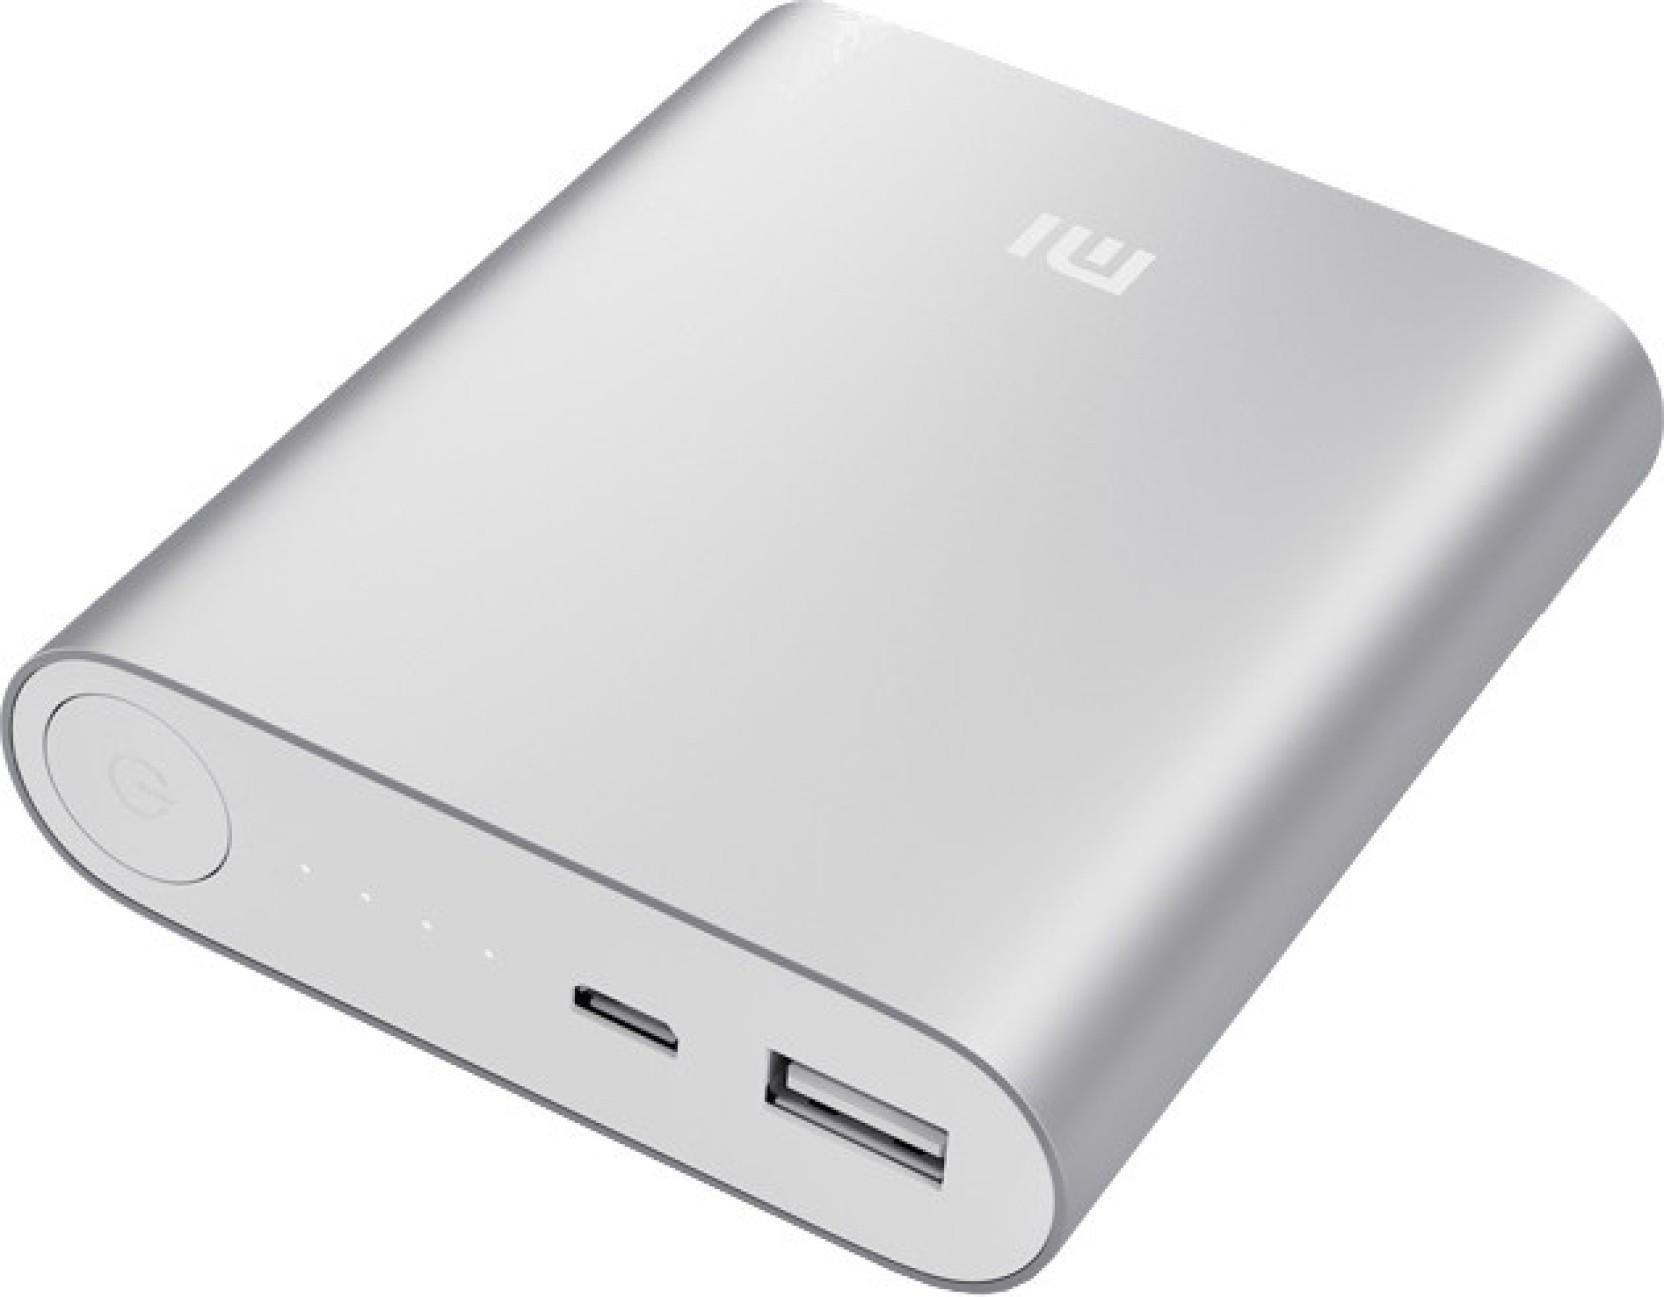 Mi 10400 Mah Power Bank Bestseller Xiaomi Powerbank 10000mah Pro 2 10000 Fast Charging Home